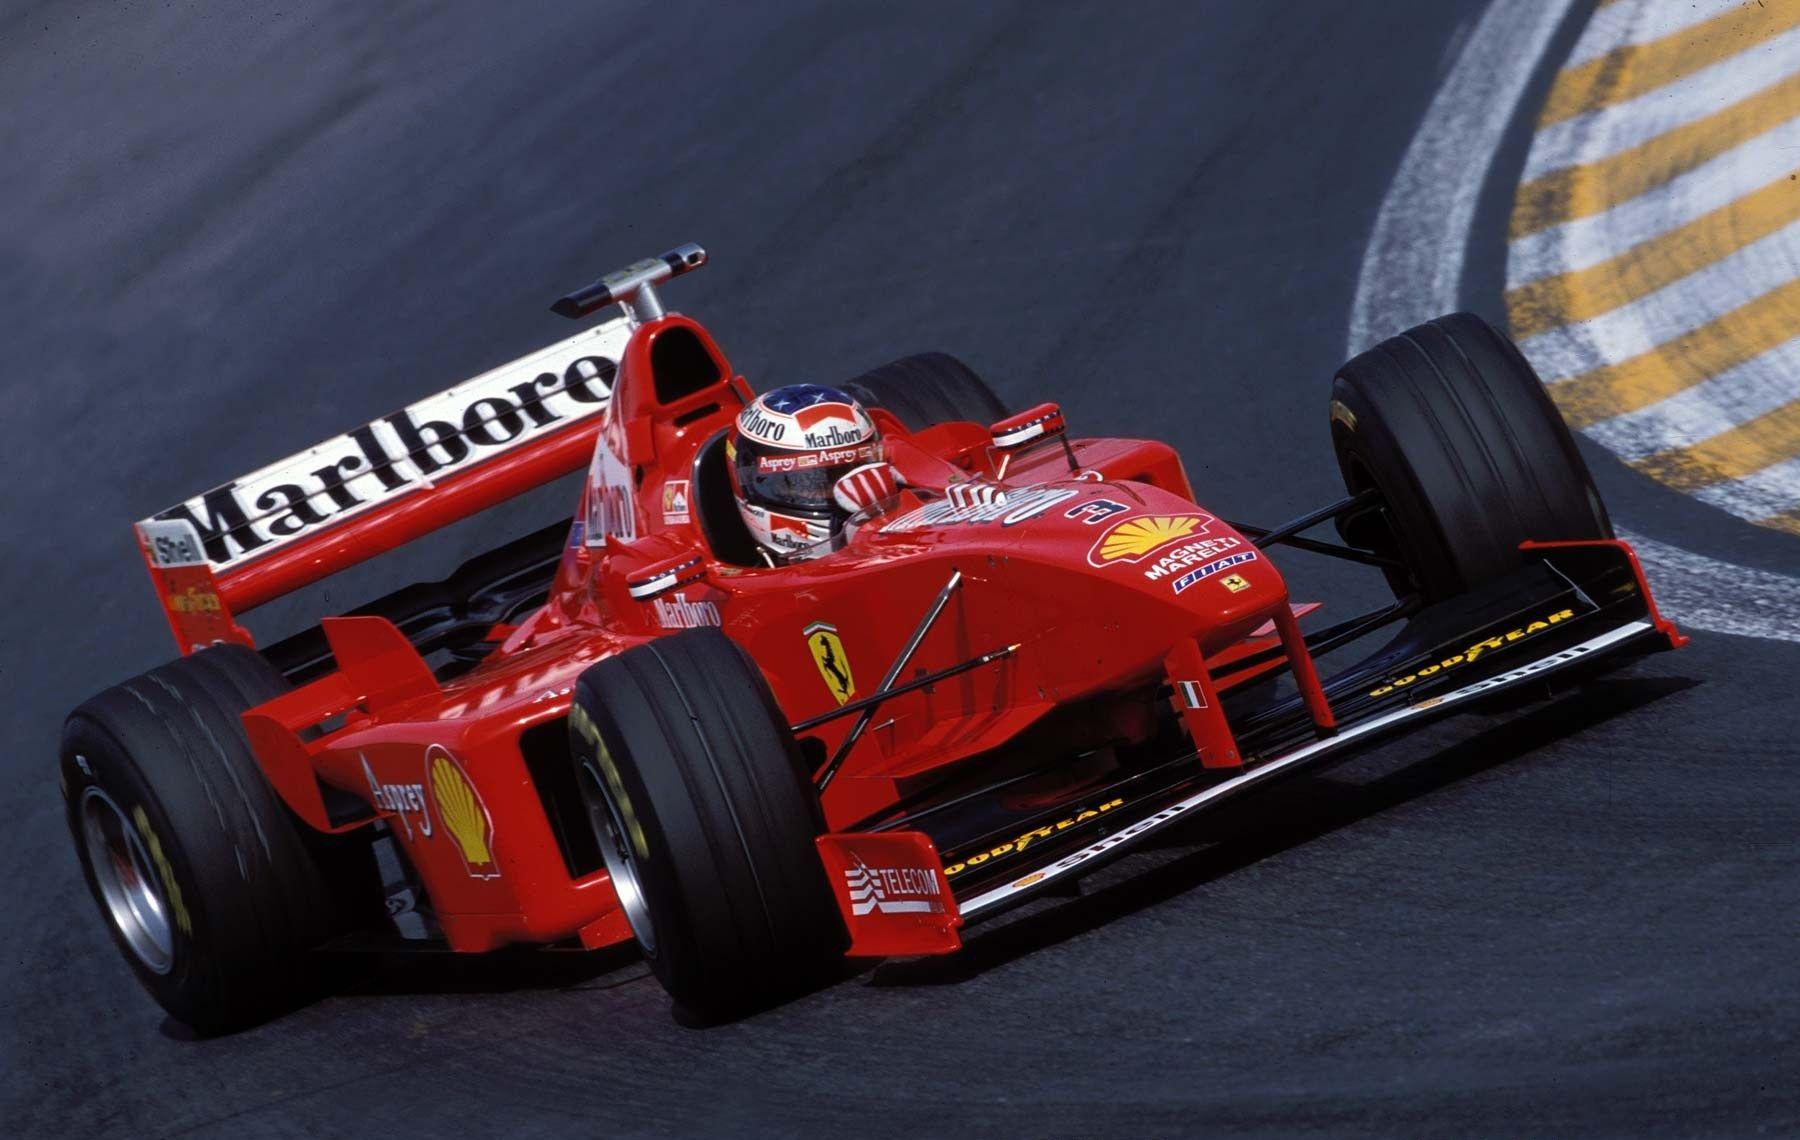 1998 GP Brazylii (Interlagos) Ferrari F300 (Michael Schumacher)